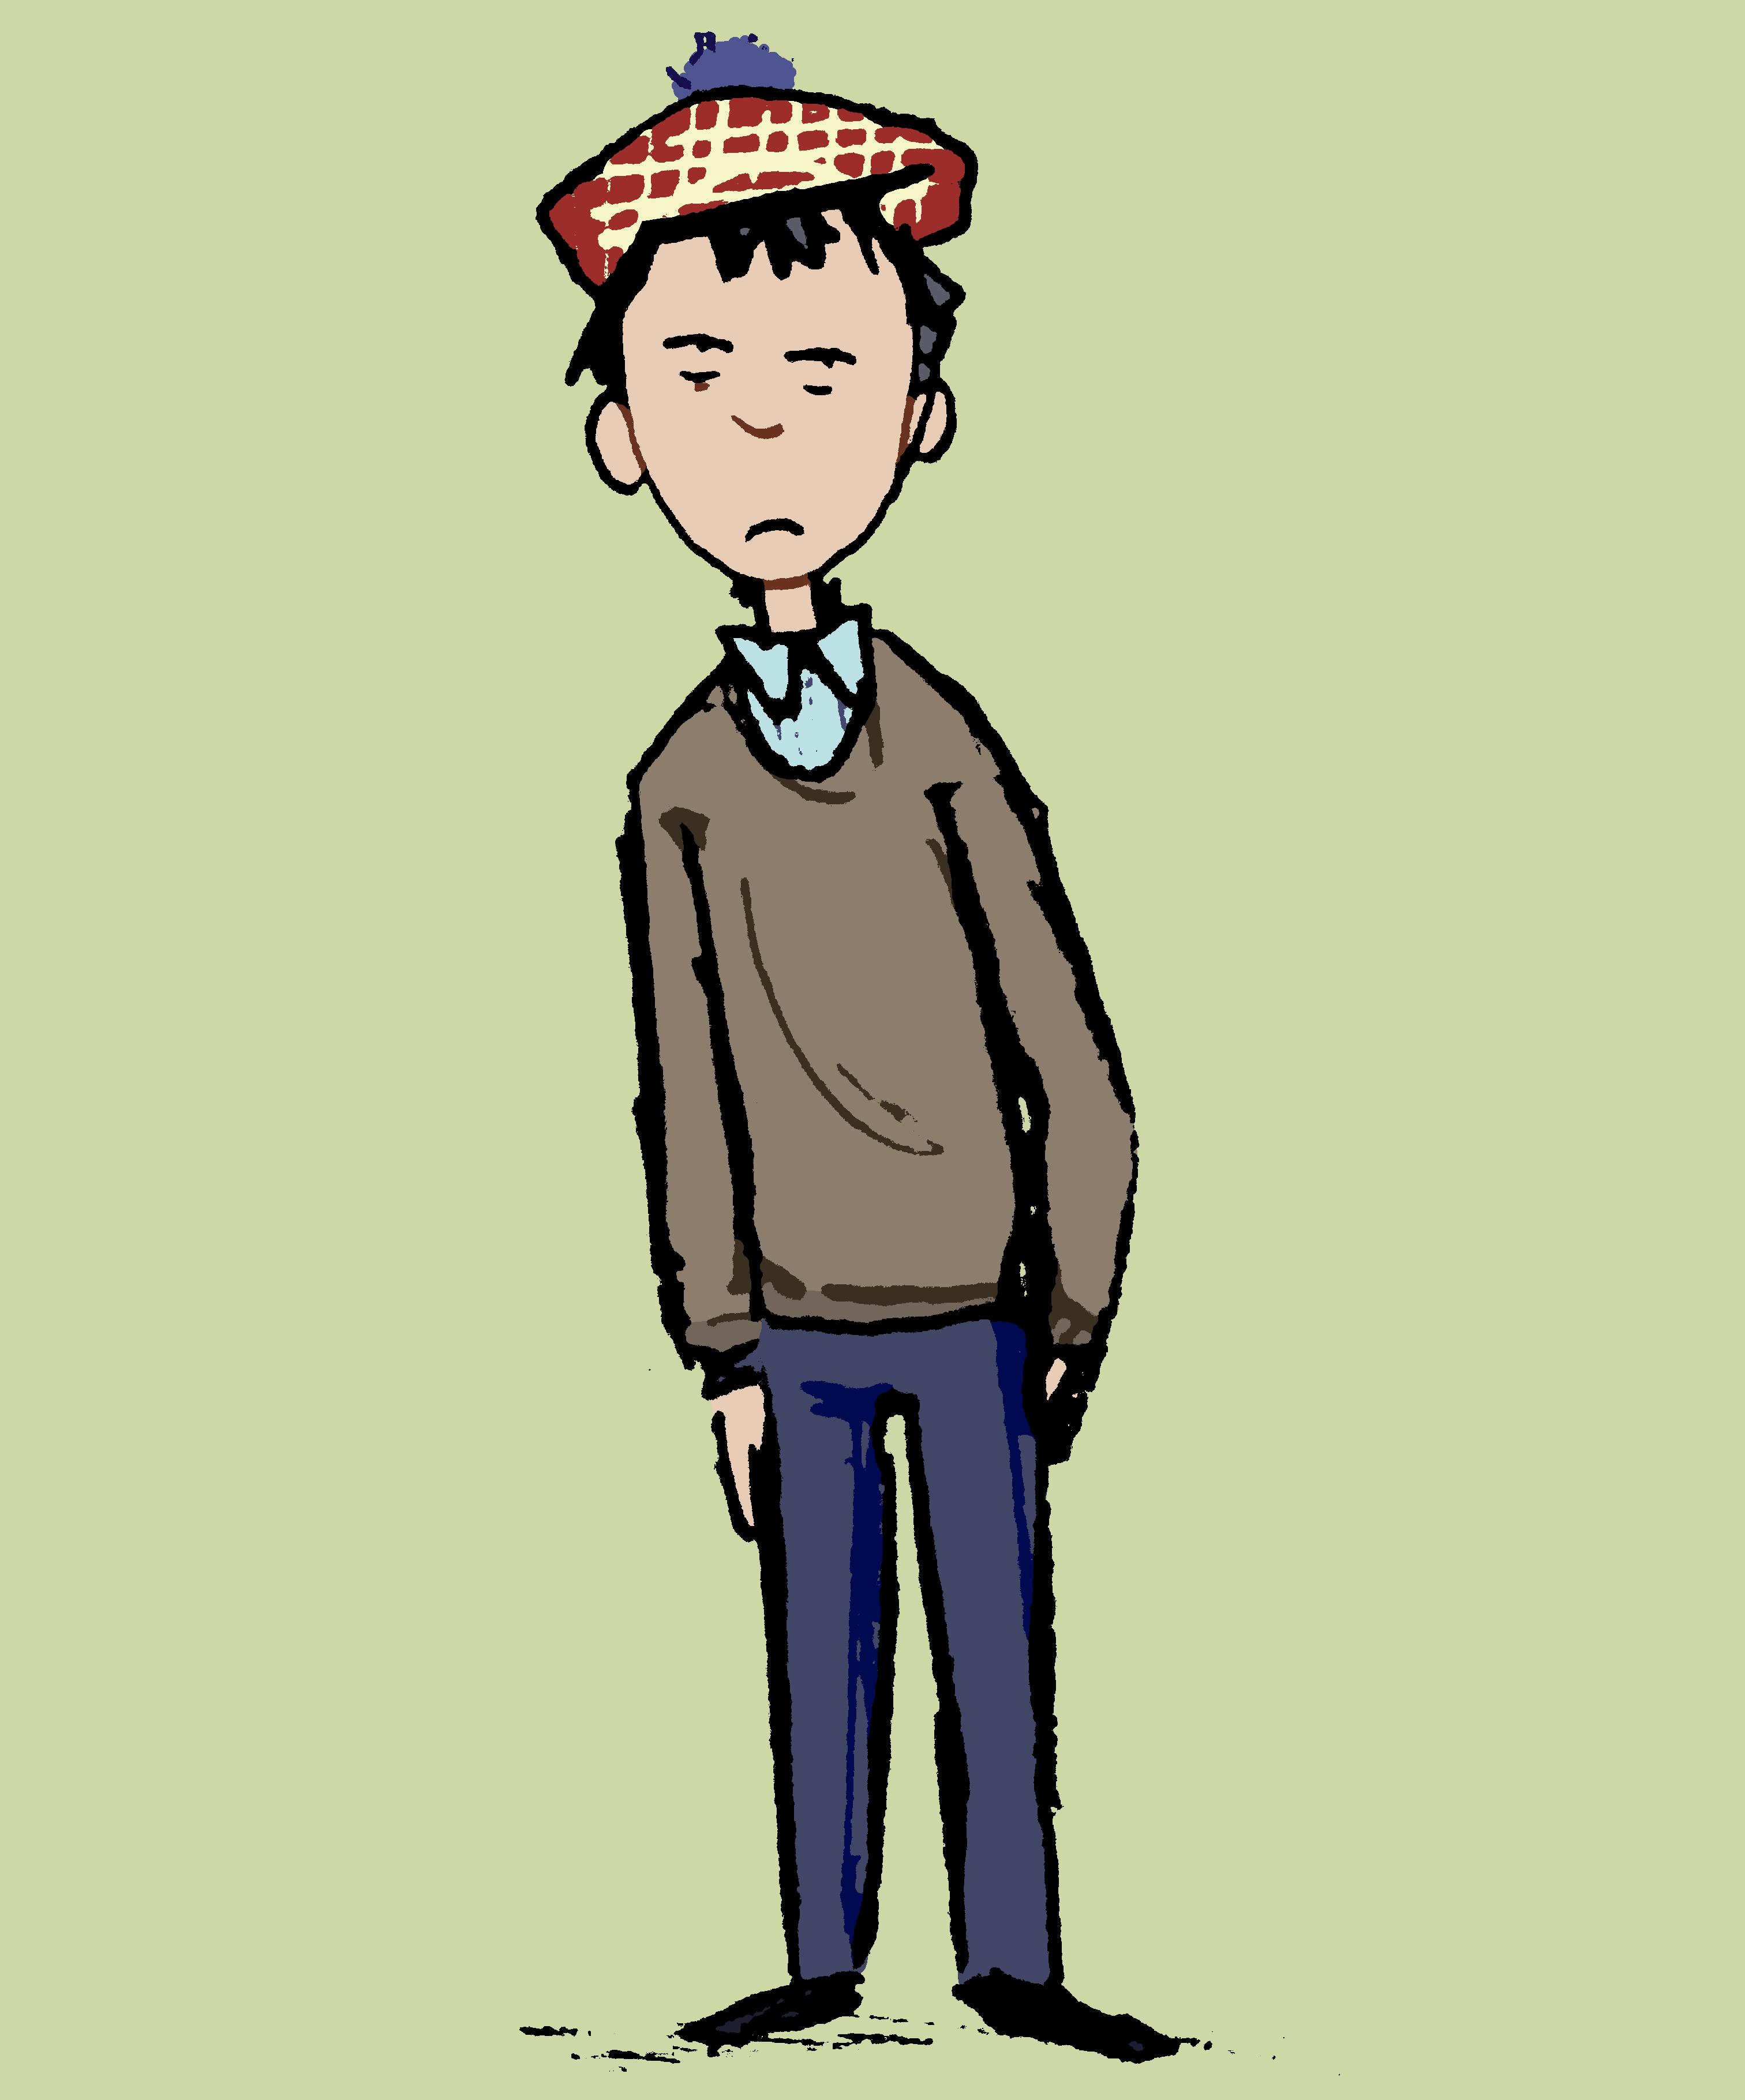 Scottish hat